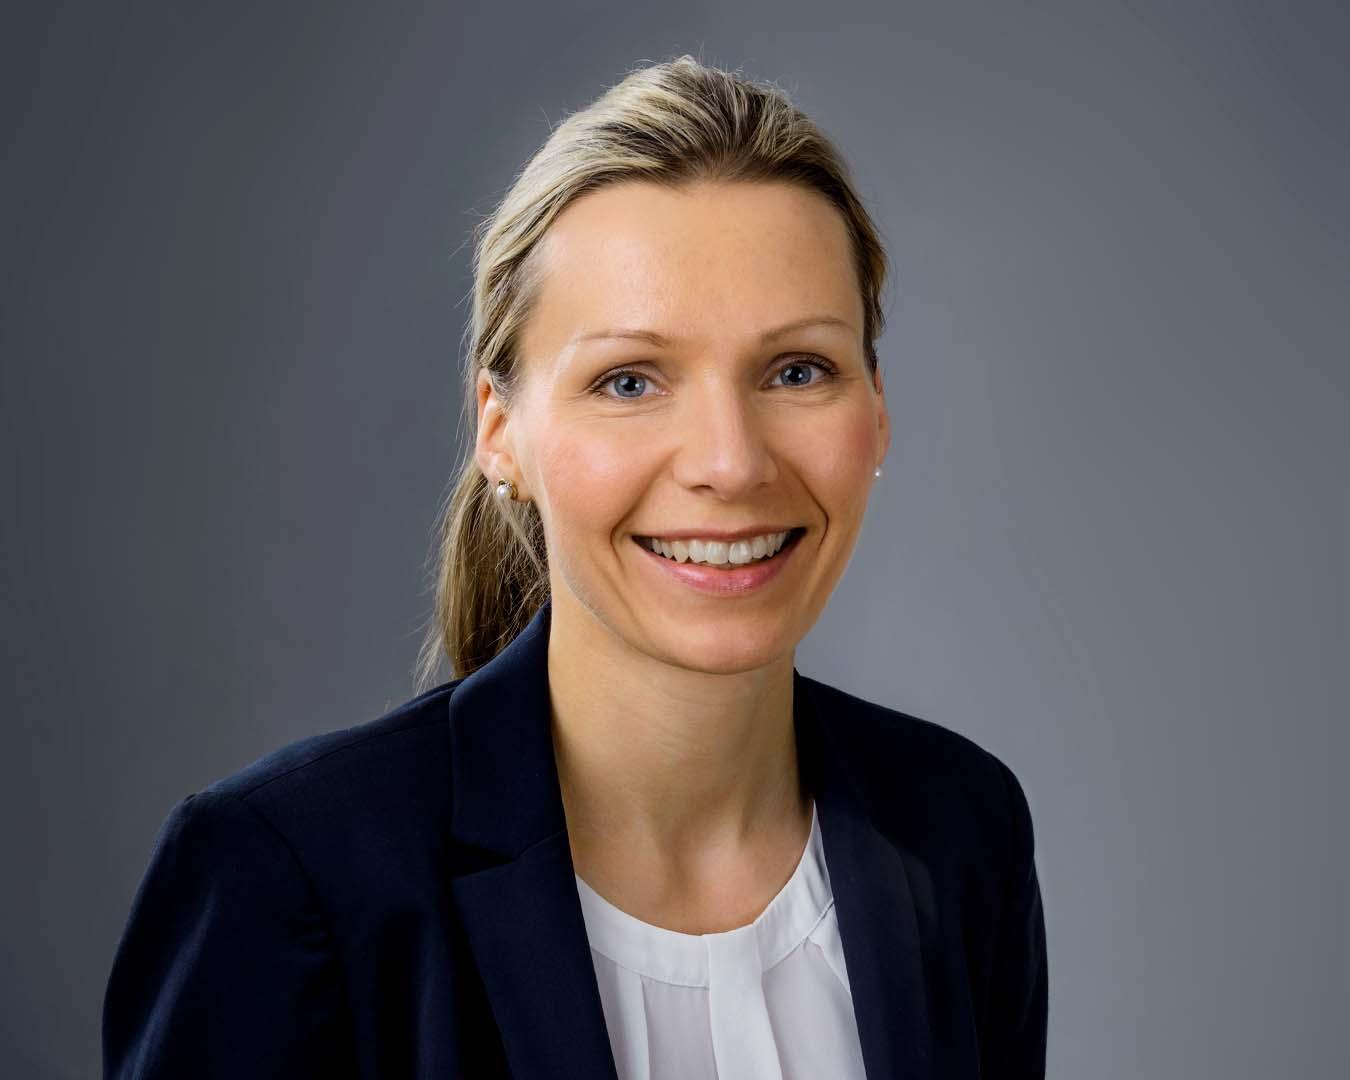 fotograf-businessfotos-bewerbungsfotos-weinheim-mannheim-heidelberg